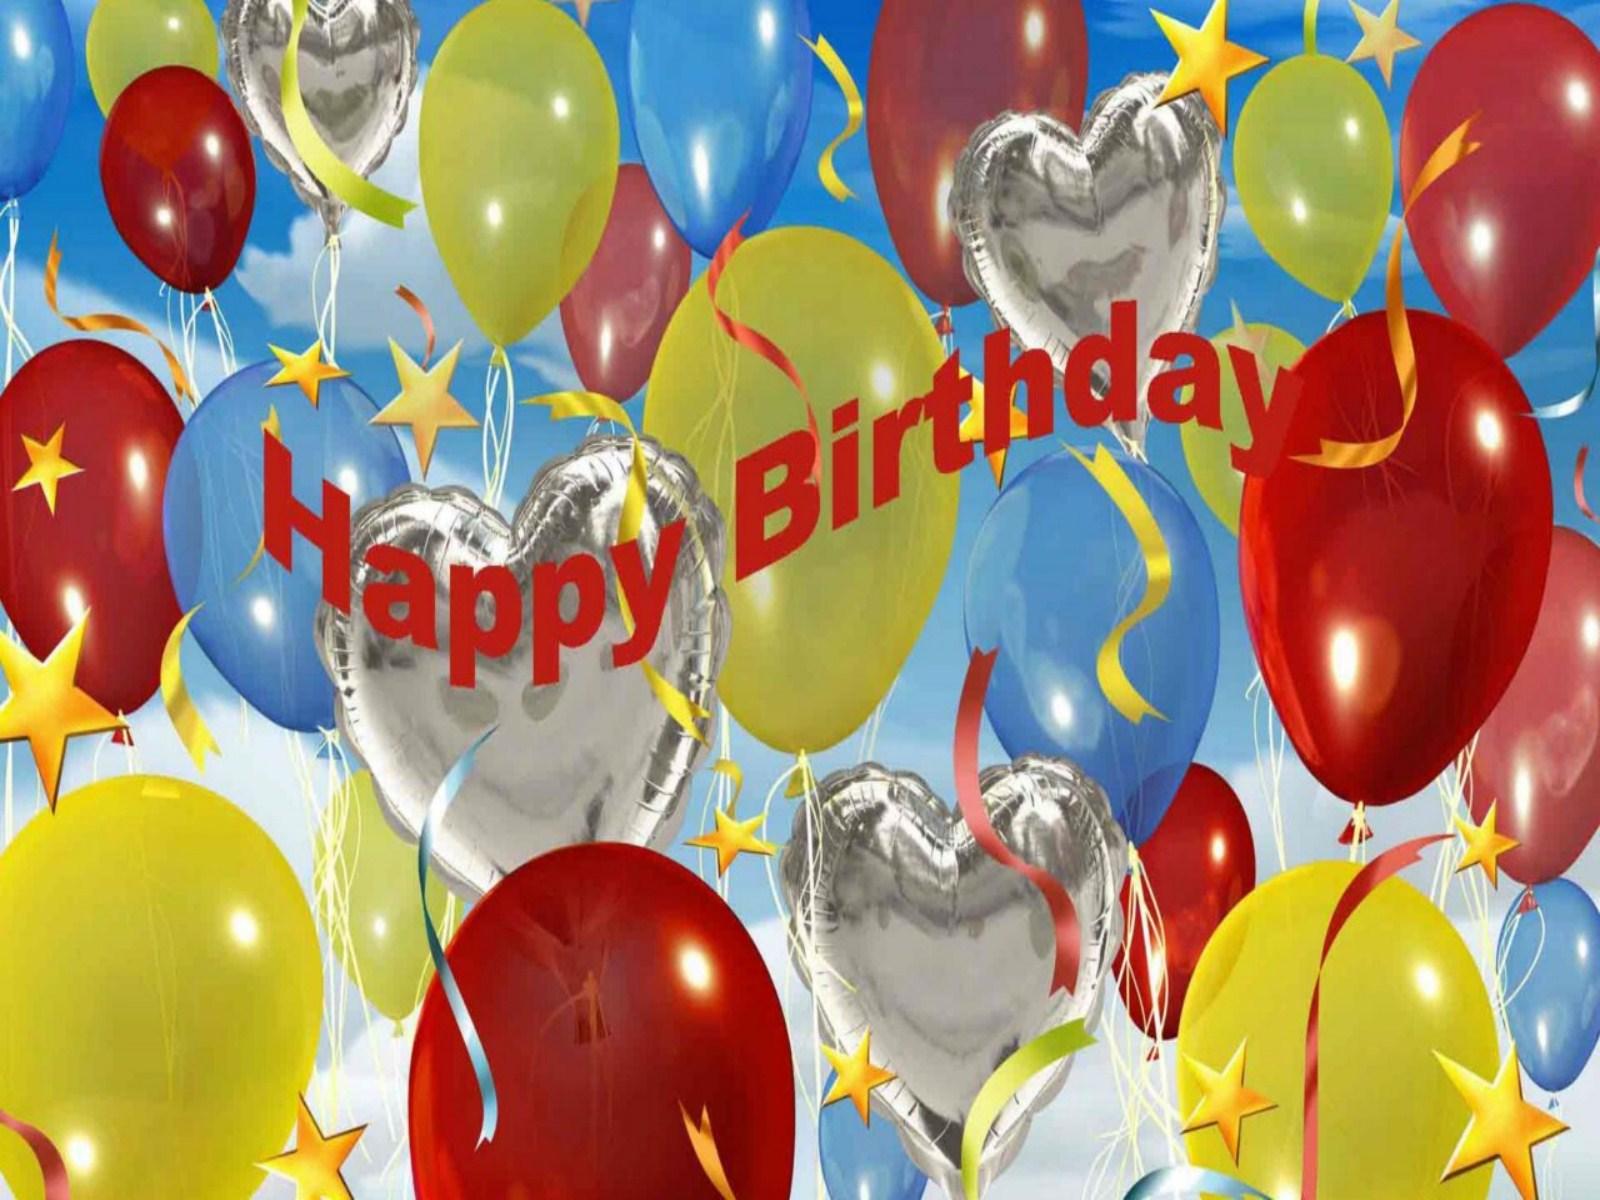 49+] Free Birthday Screensavers and Wallpaper on WallpaperSafari